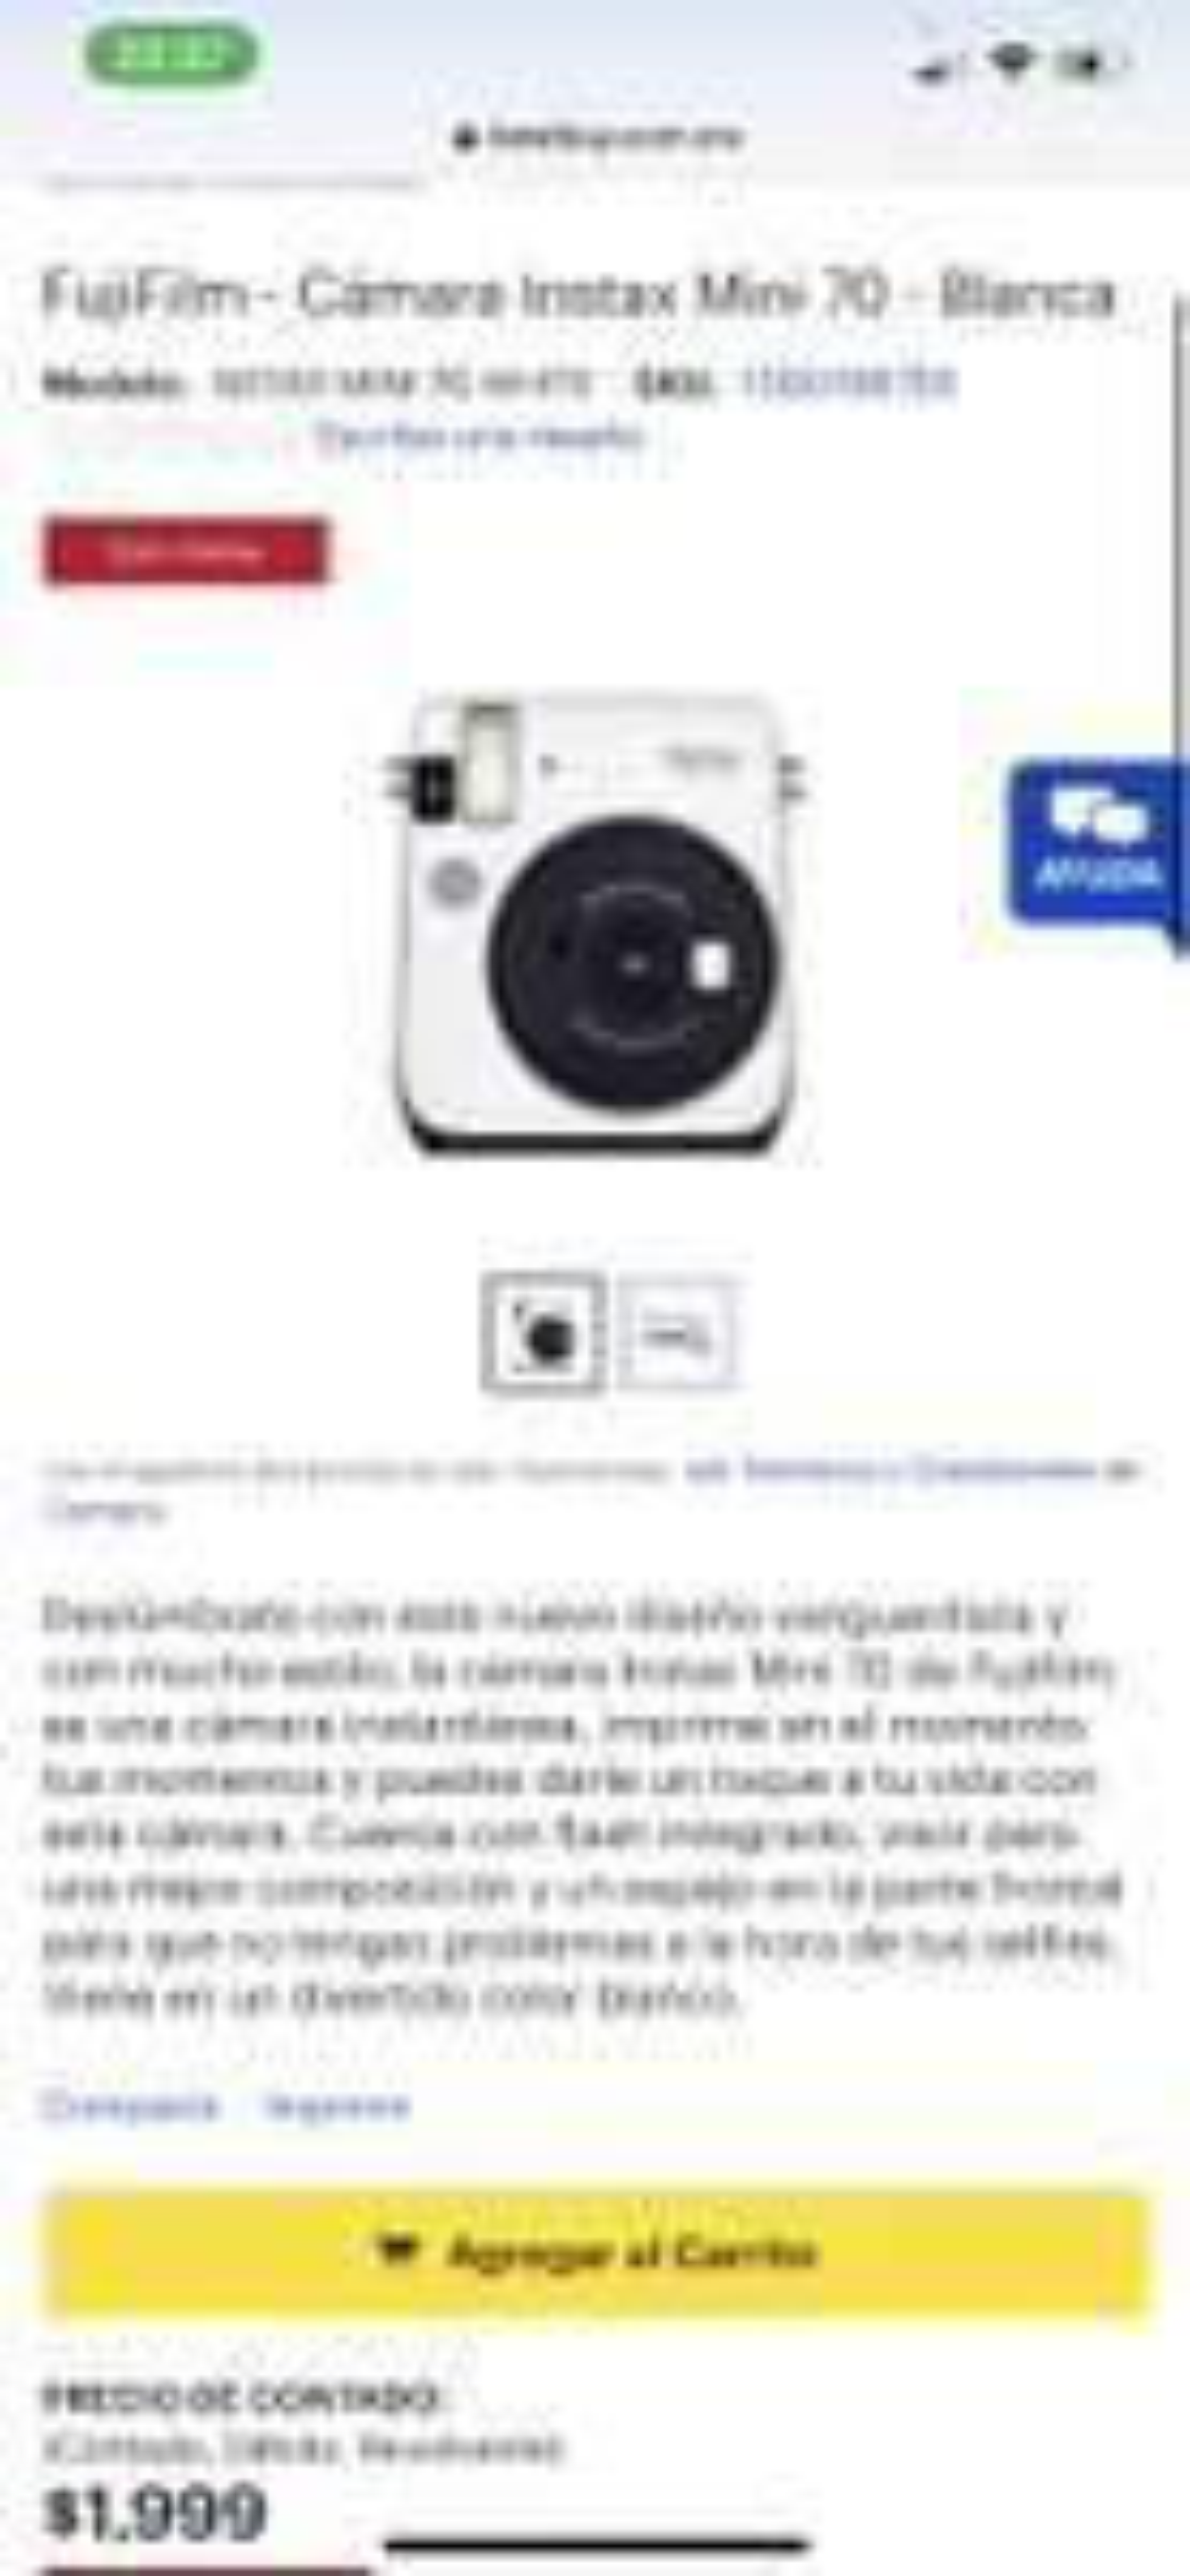 Best Buy: FujiFilm - Cámara Instax Mini 70